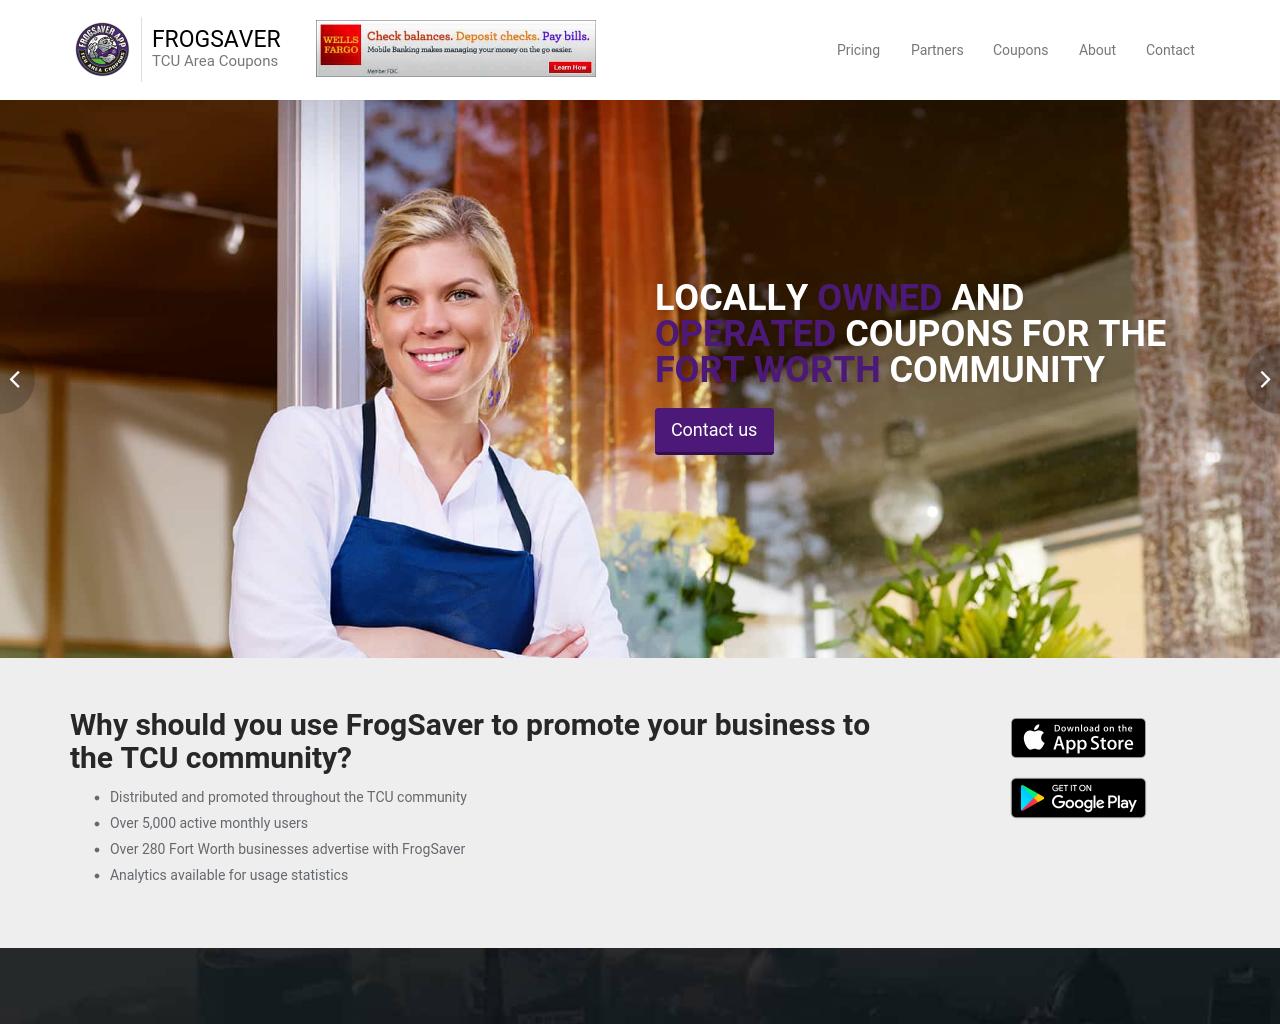 Frogsaver.com-Advertising-Reviews-Pricing